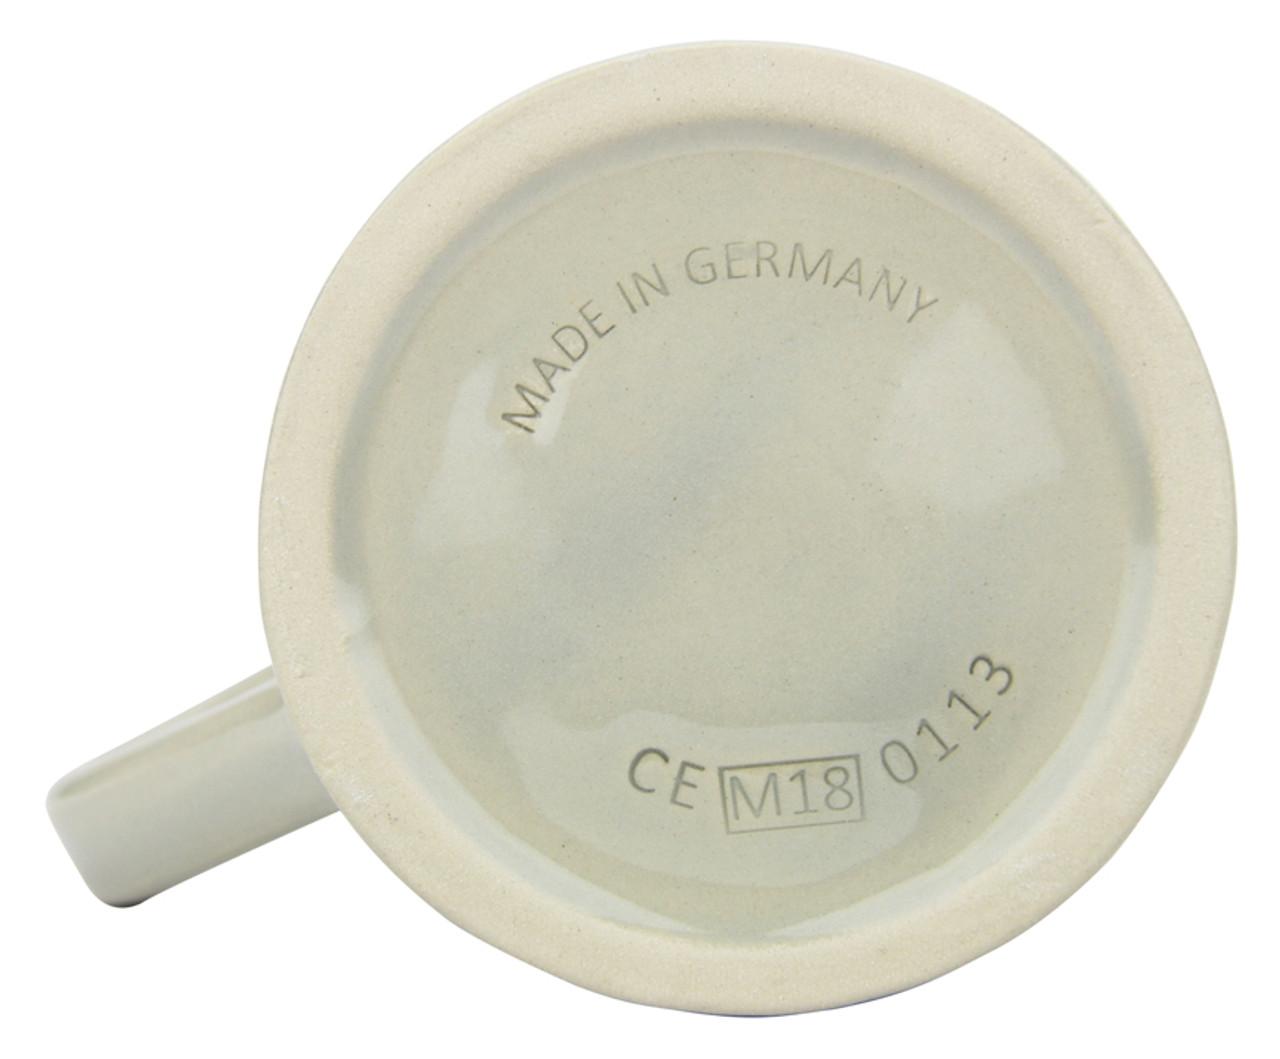 Bottom, 1 Liter Stoneware Beer Mug, Made in Germany